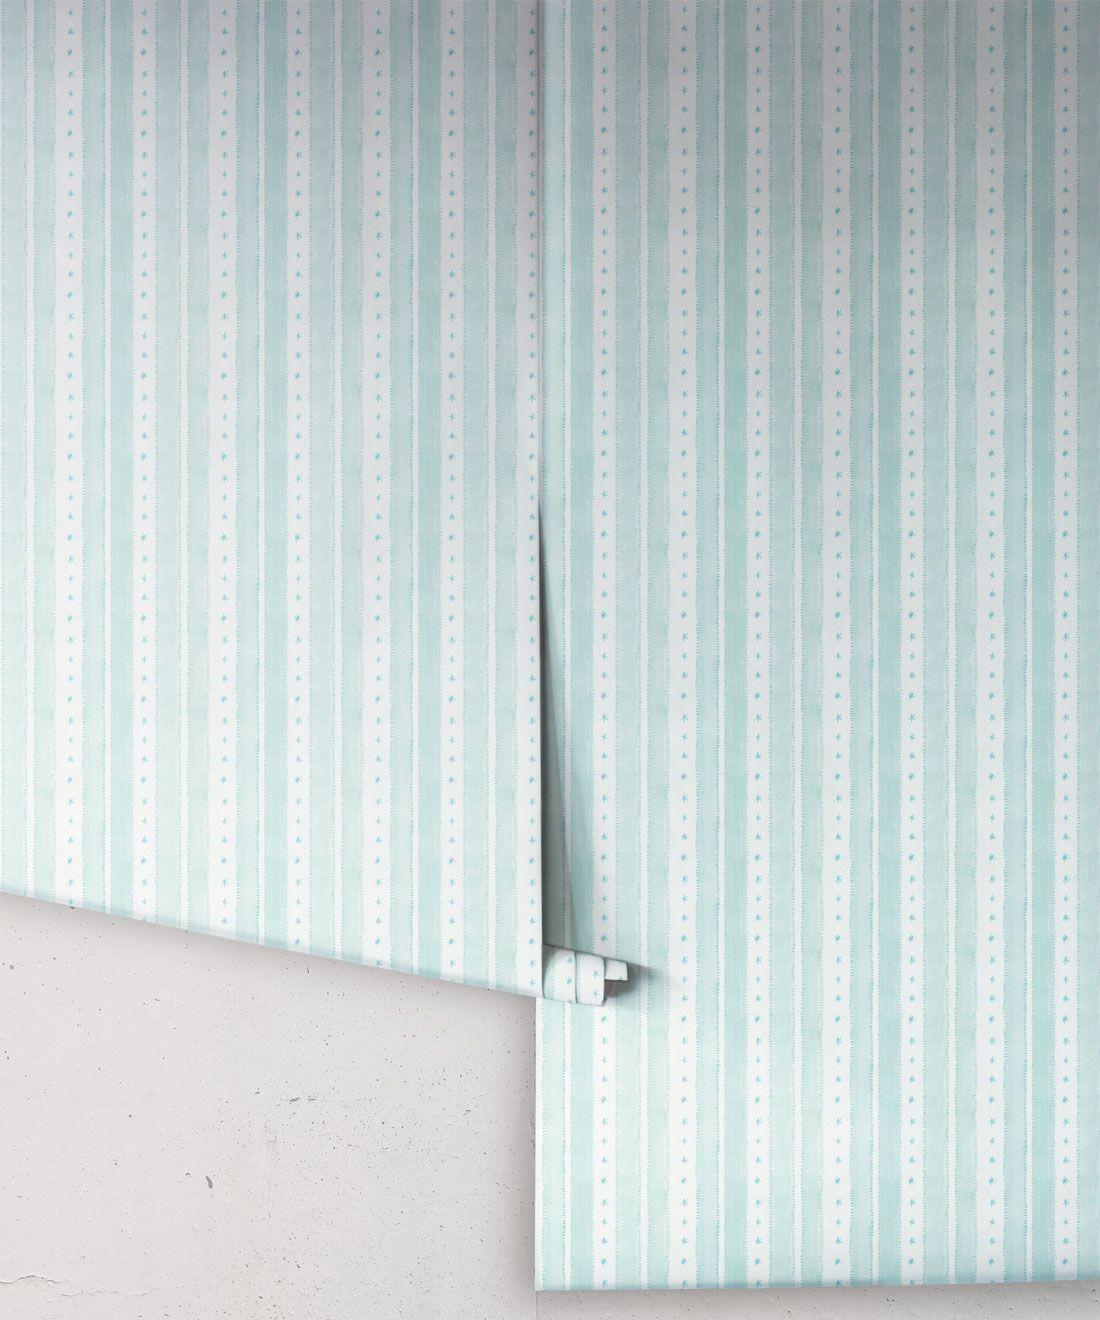 Star Stripe Wallpaper • Turquoise • Rolls